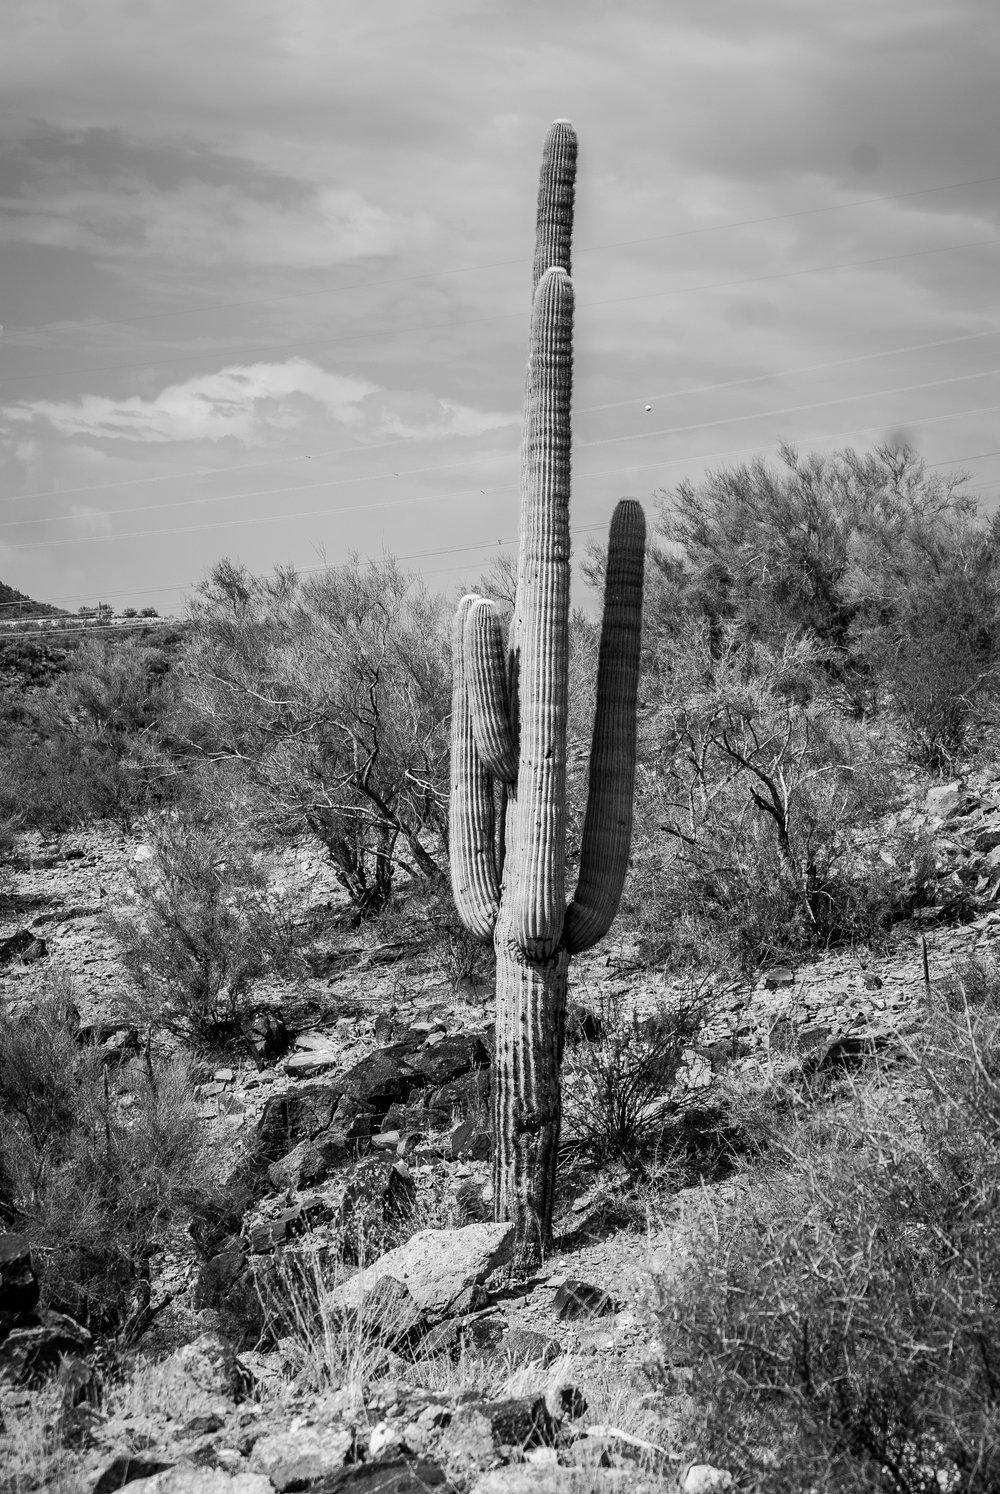 saguaro cactus outside wikieup, az  photograph by jaclyn michelle